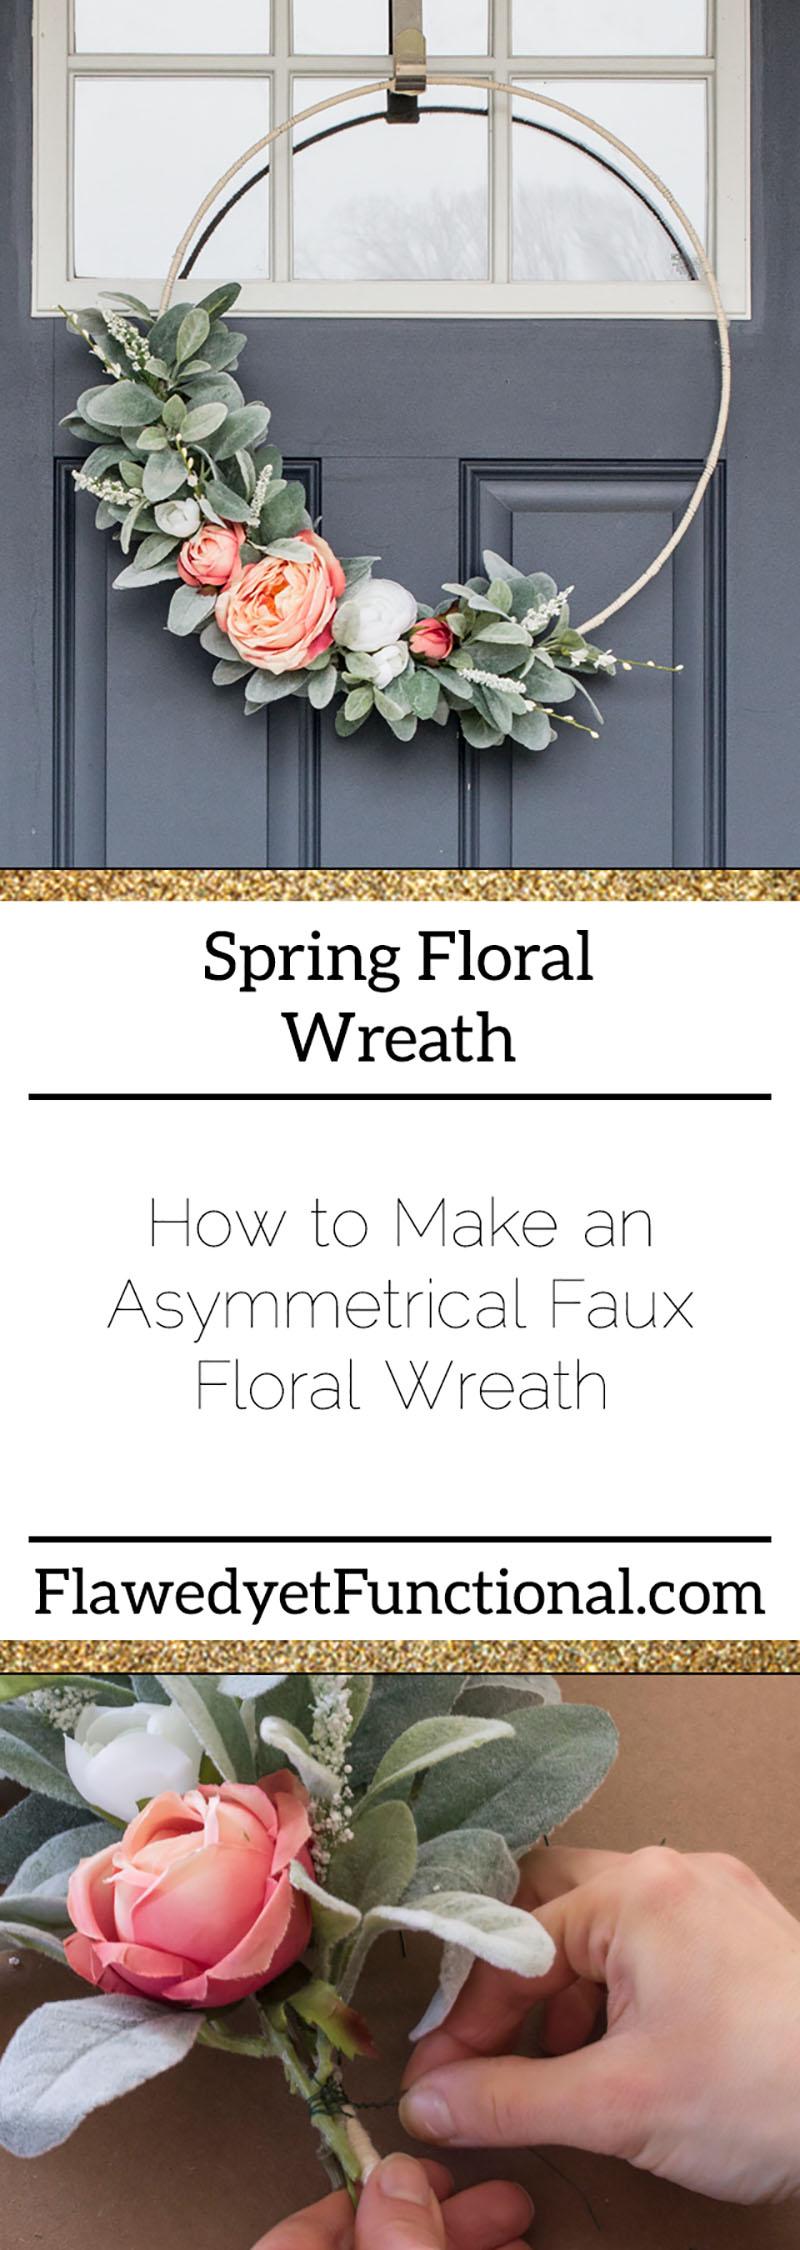 https://thecottagemarket.com/wp-content/uploads/2019/02/Spring-Time-Farmhouse-Wreath-3.jpg